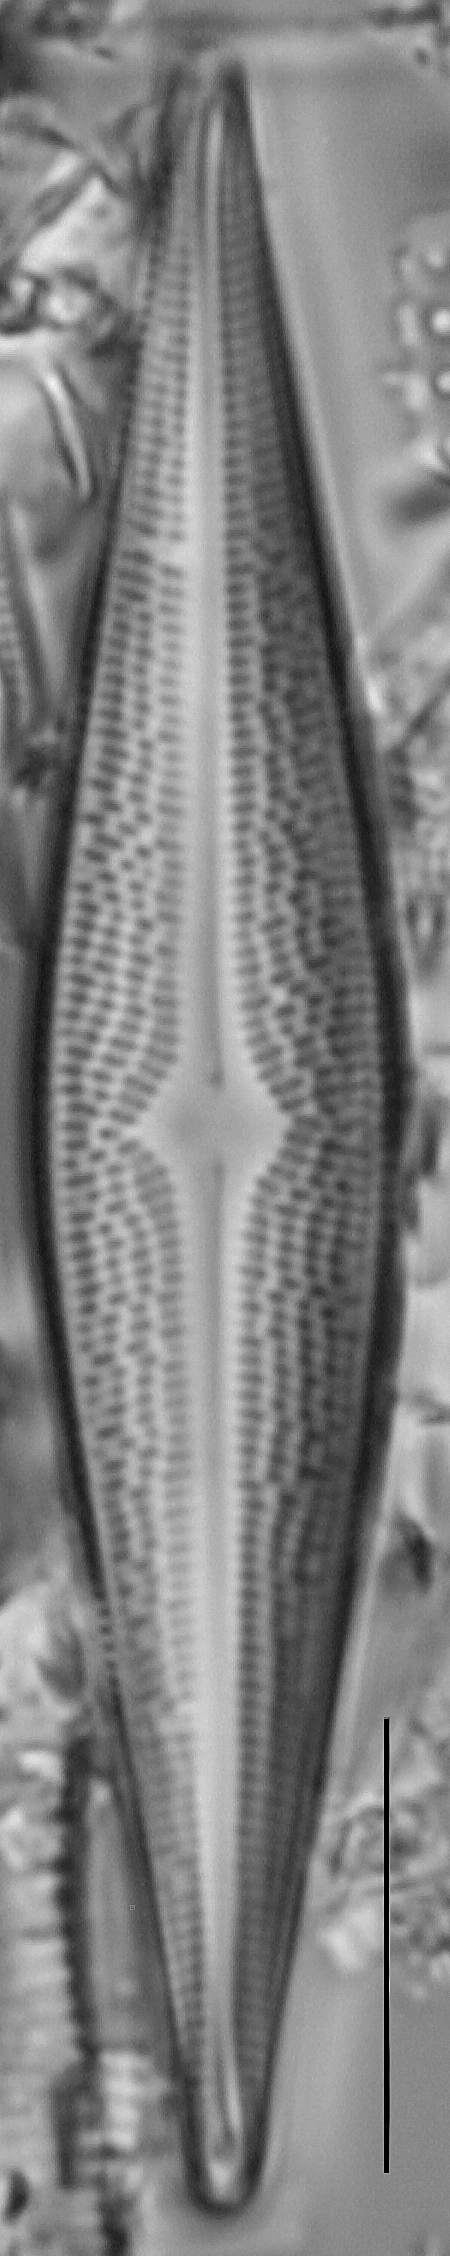 Bracysira neoacuta LM7